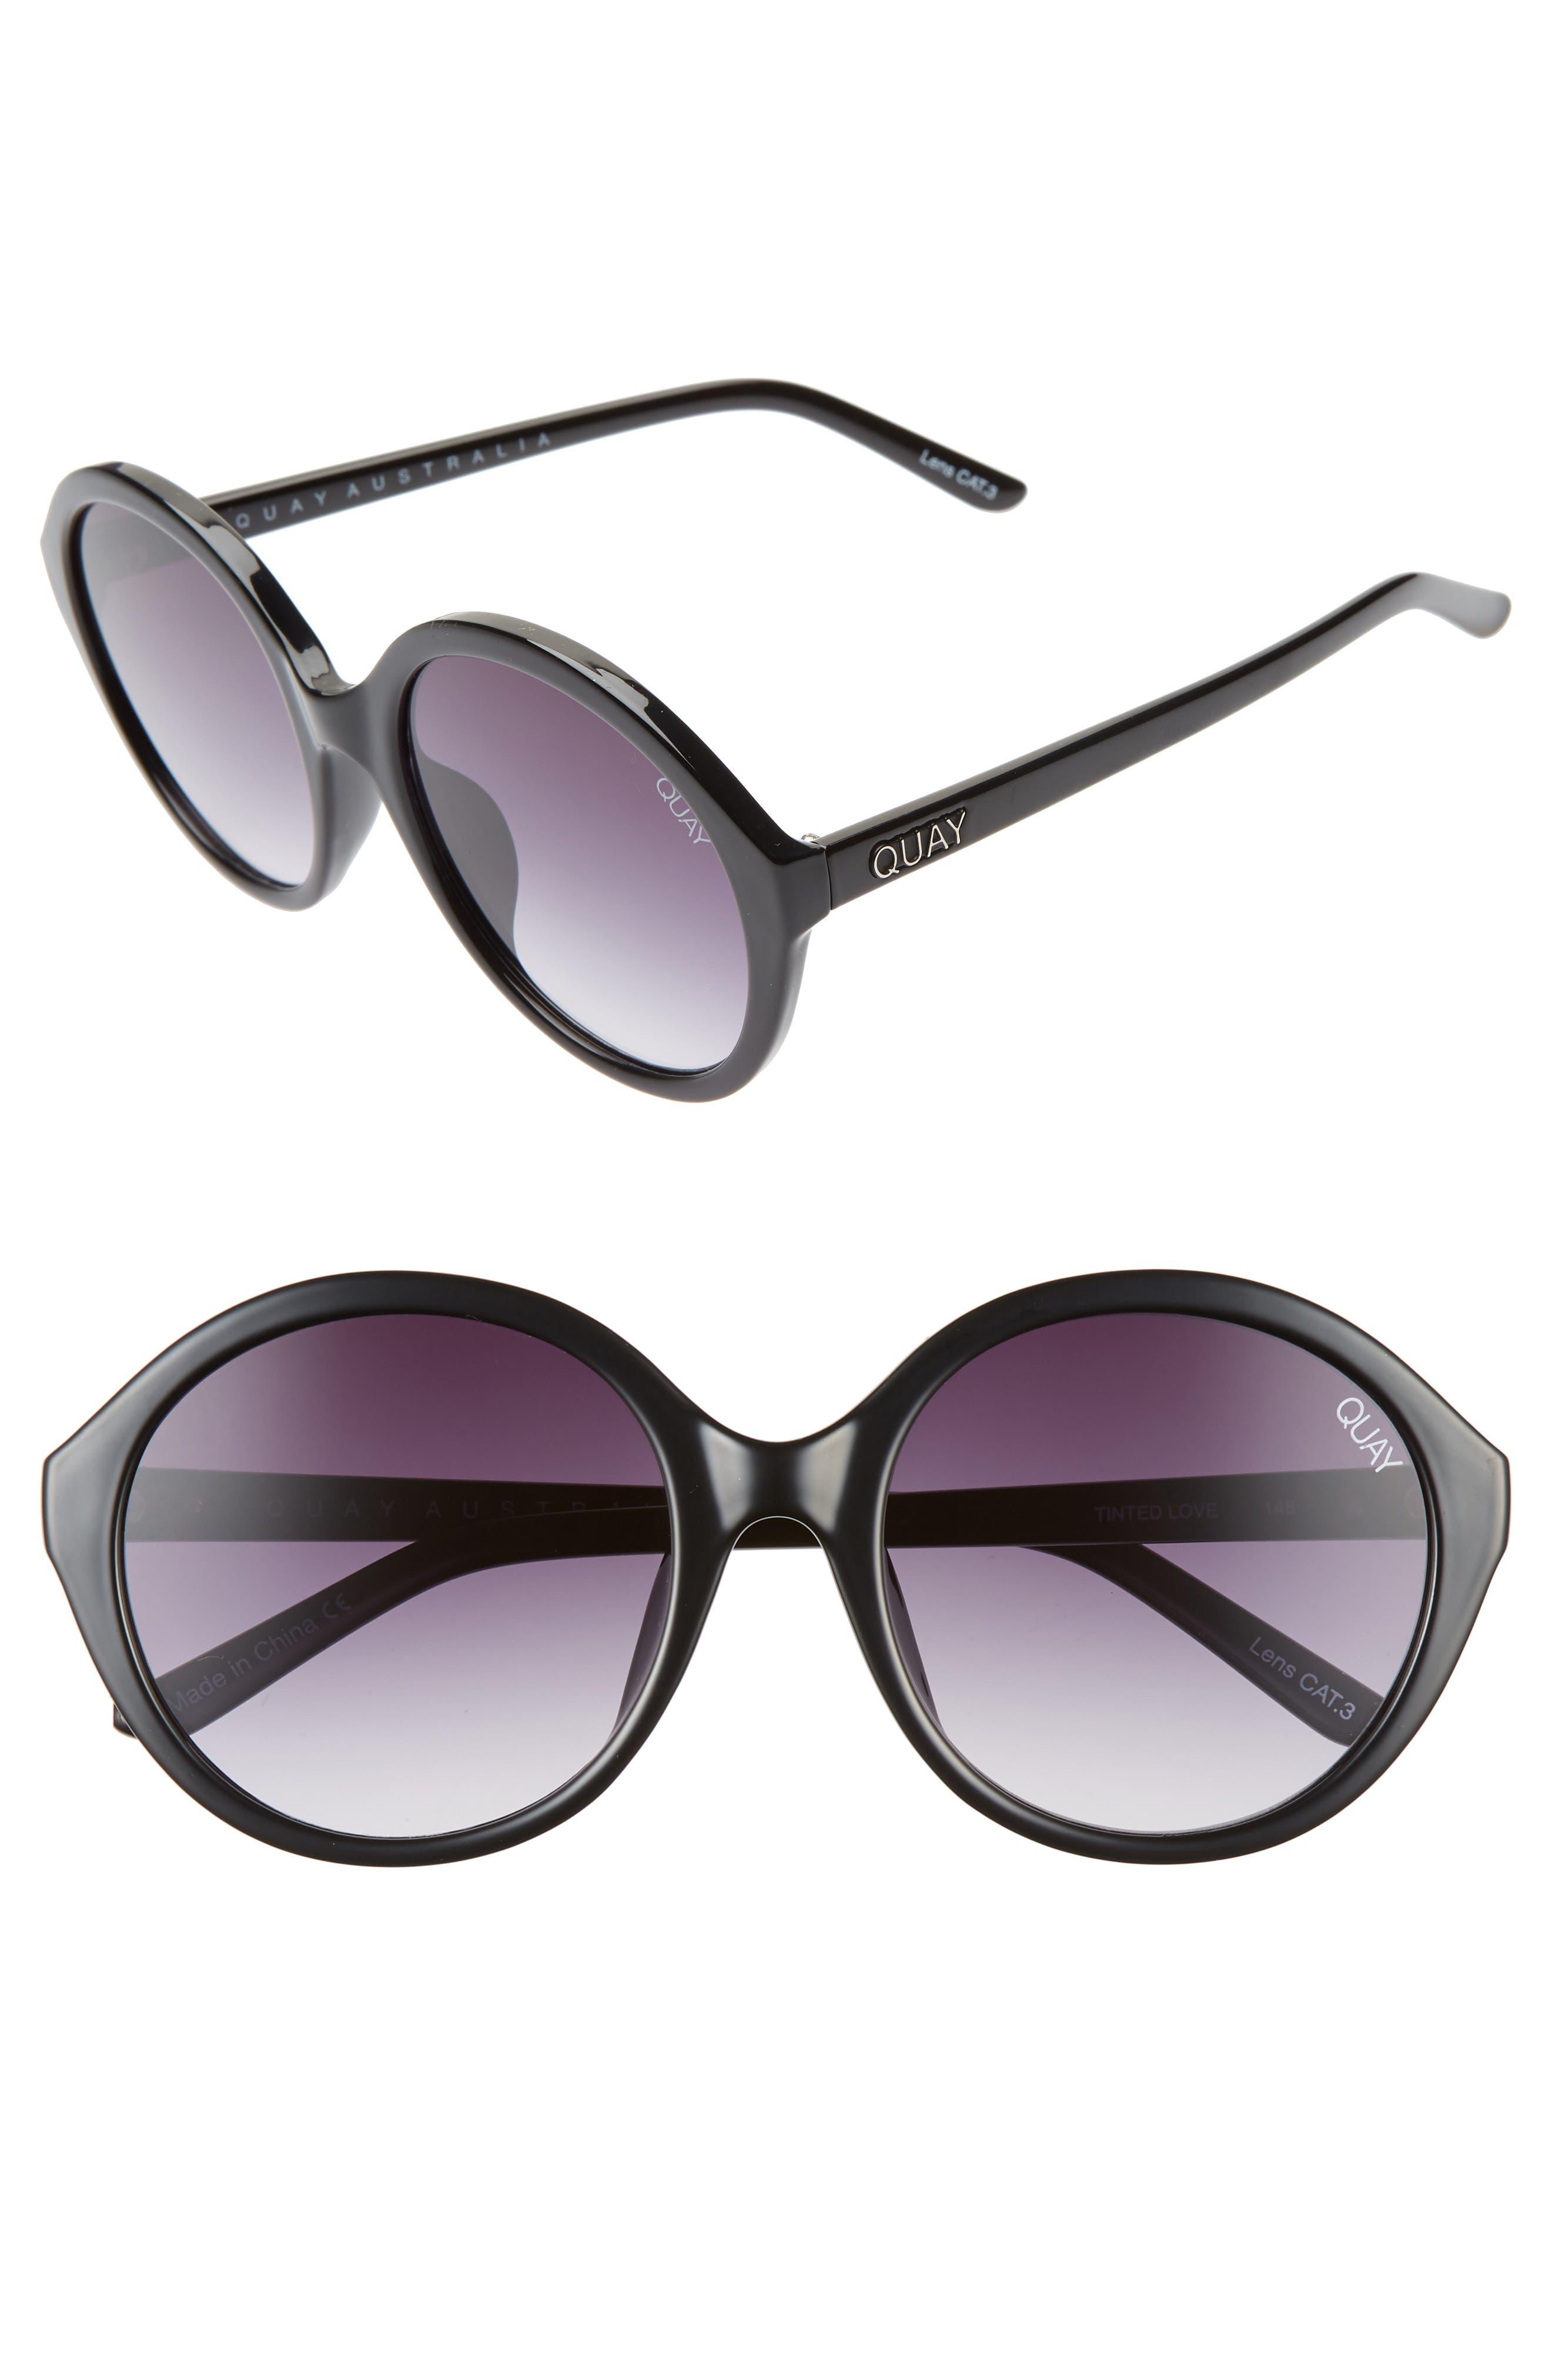 Quay Australia X Benefit Tinted Love 55Mm Round Sunglasses - Black/ Smoke Fade